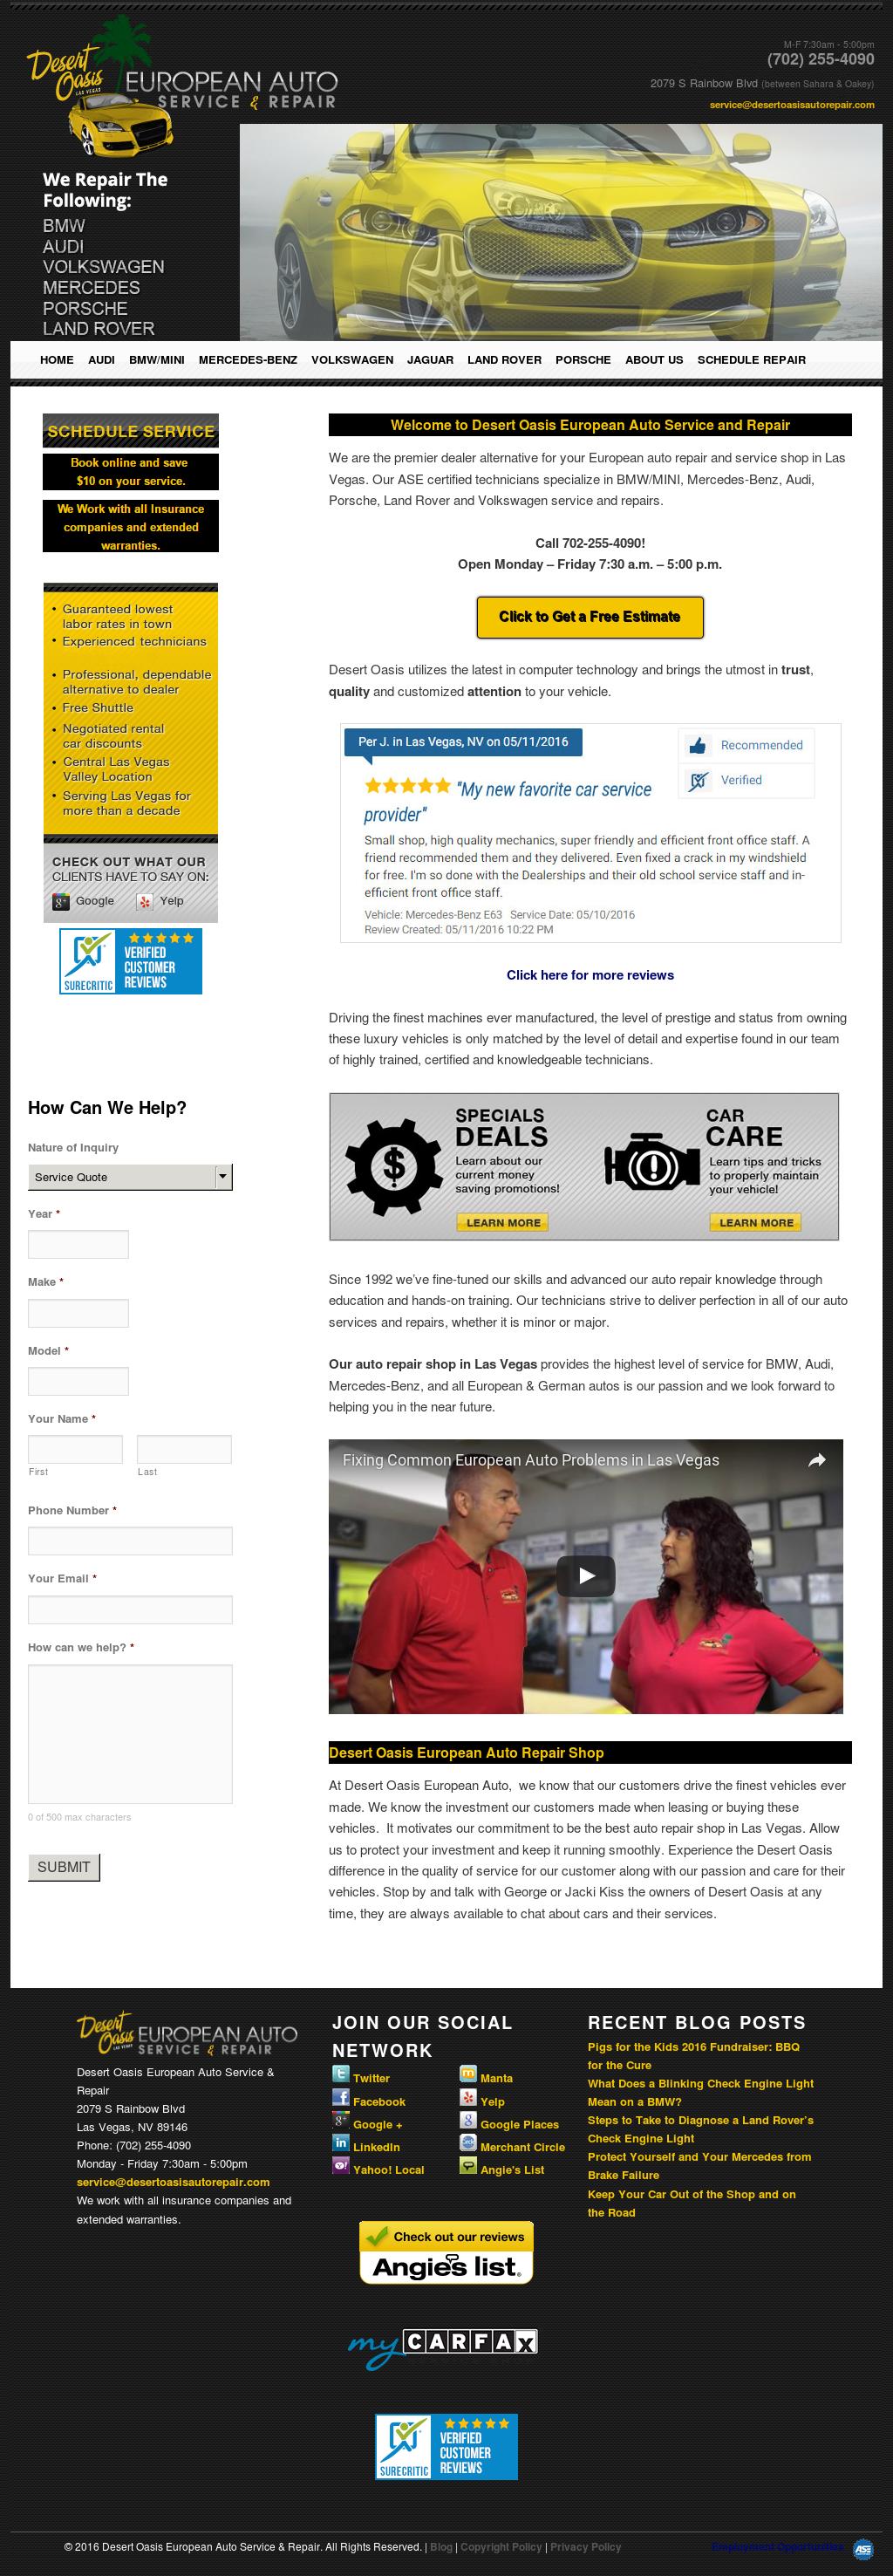 pompiere dating siti Web